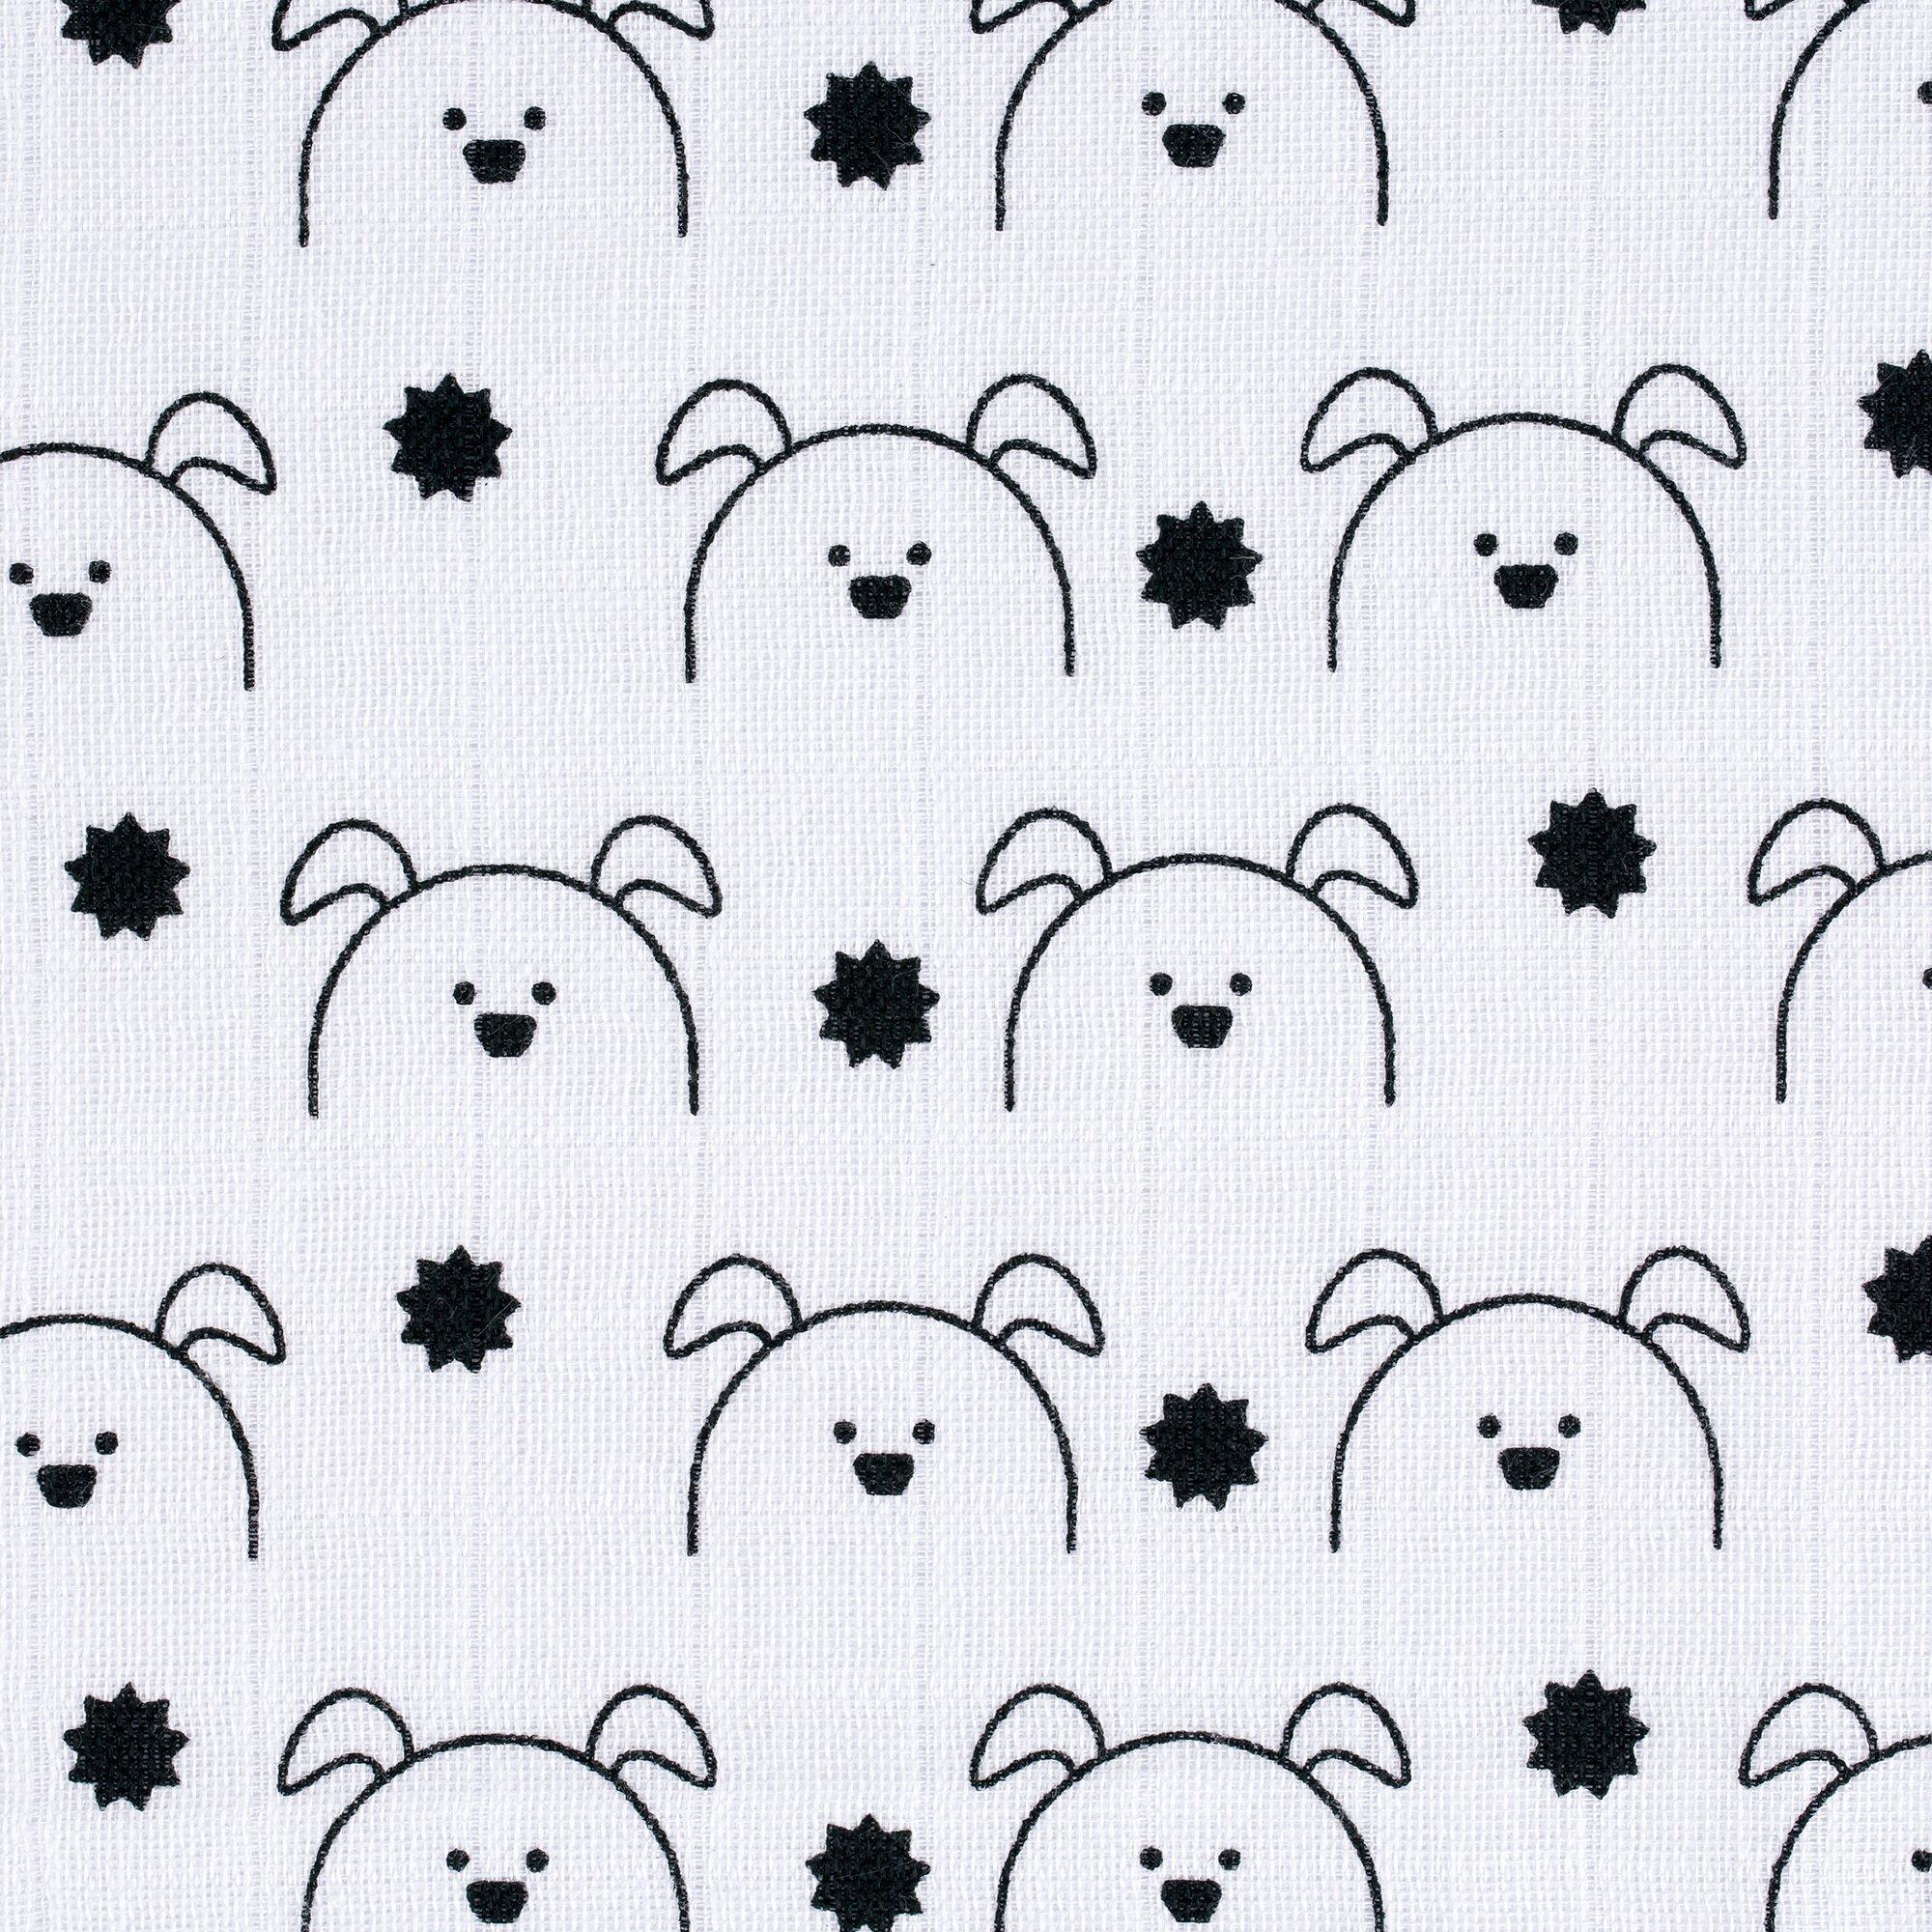 lassig-2er-pack-mullwindel-swaddle-burp-blanket-xl-little-chums-120x120-cm